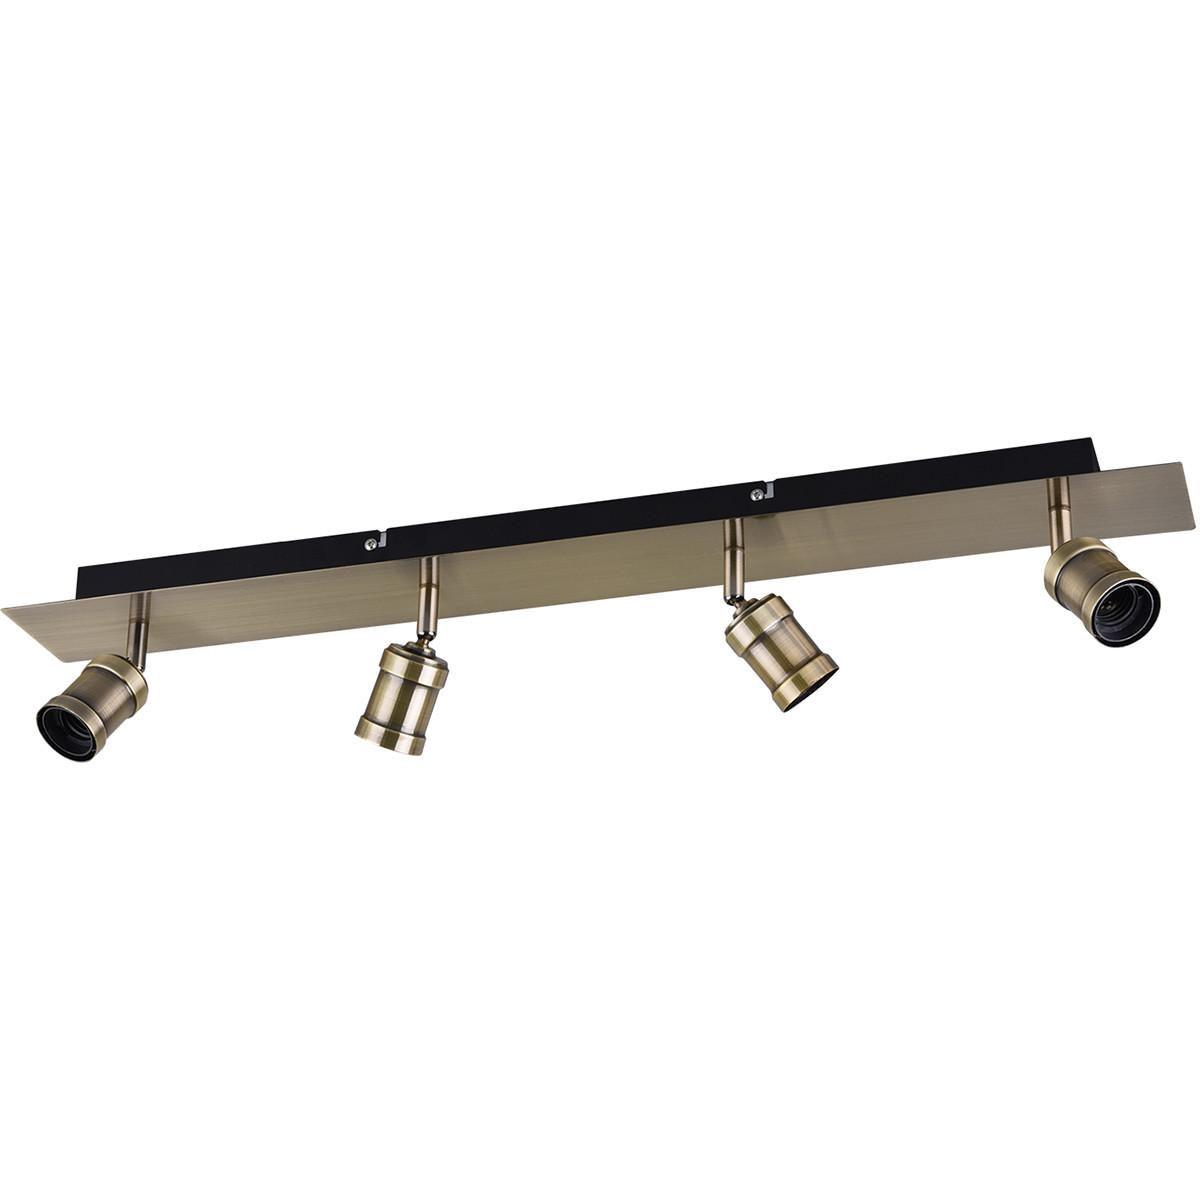 LED Plafondspot - Trion Korli - E27 Fitting - 4-lichts - Rond - Mat Brons - Aluminium